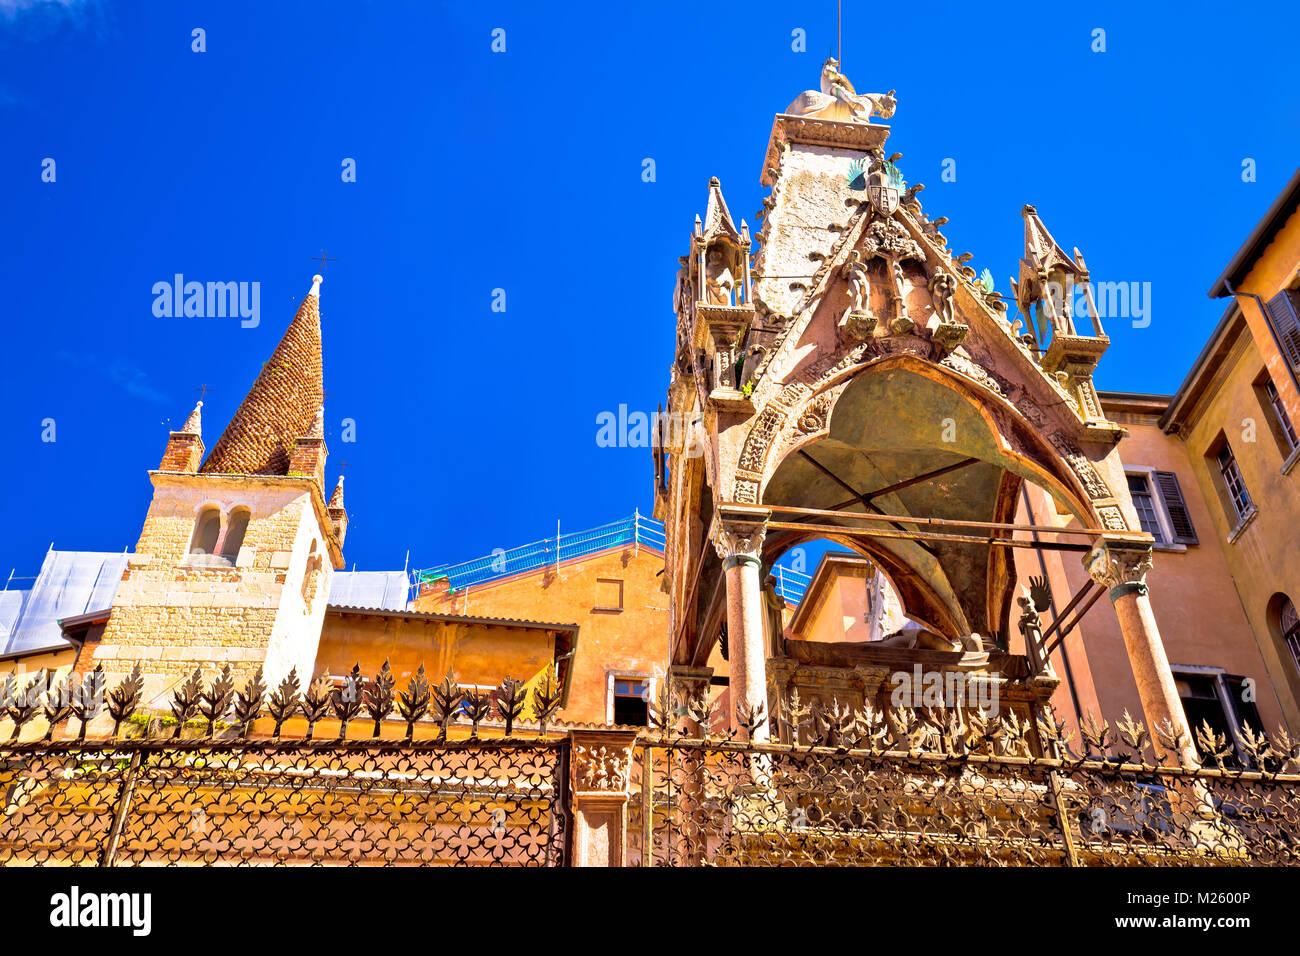 Verona landmarks and towers street view, Veneto region of Italy - Stock Image